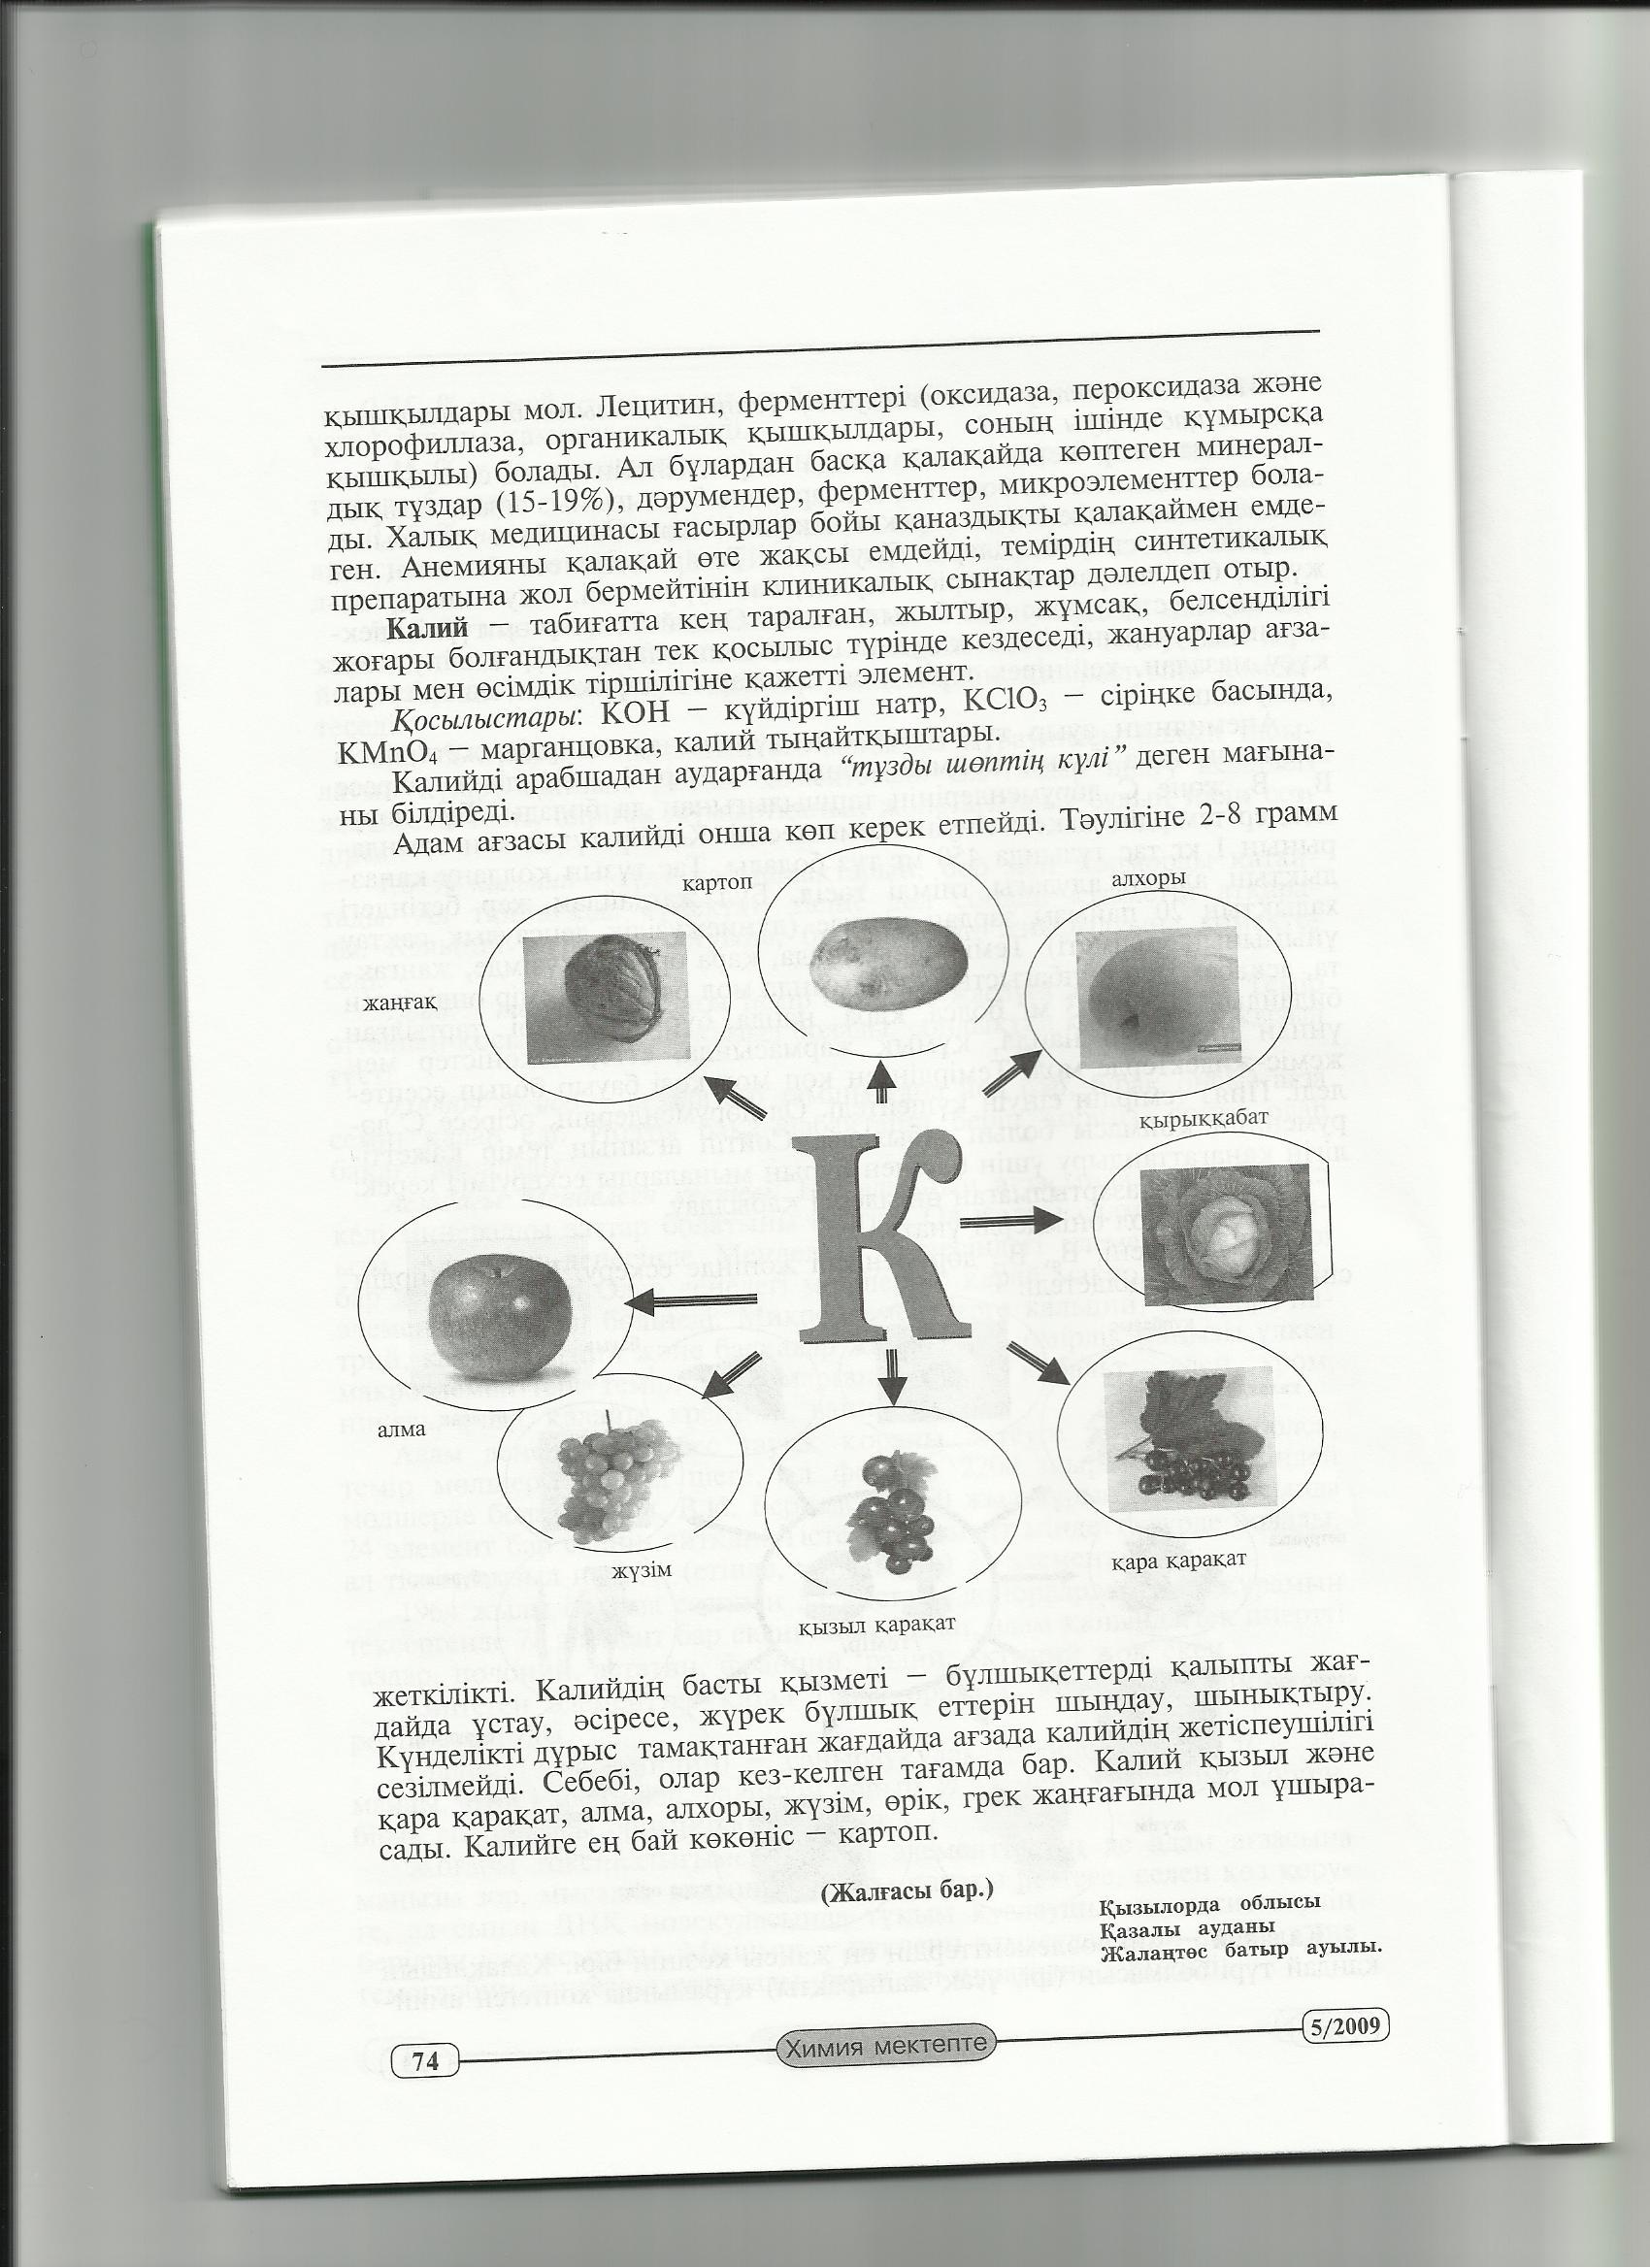 C:\Documents and Settings\Администратор\Рабочий стол\Новая папка (3)\14.jpg